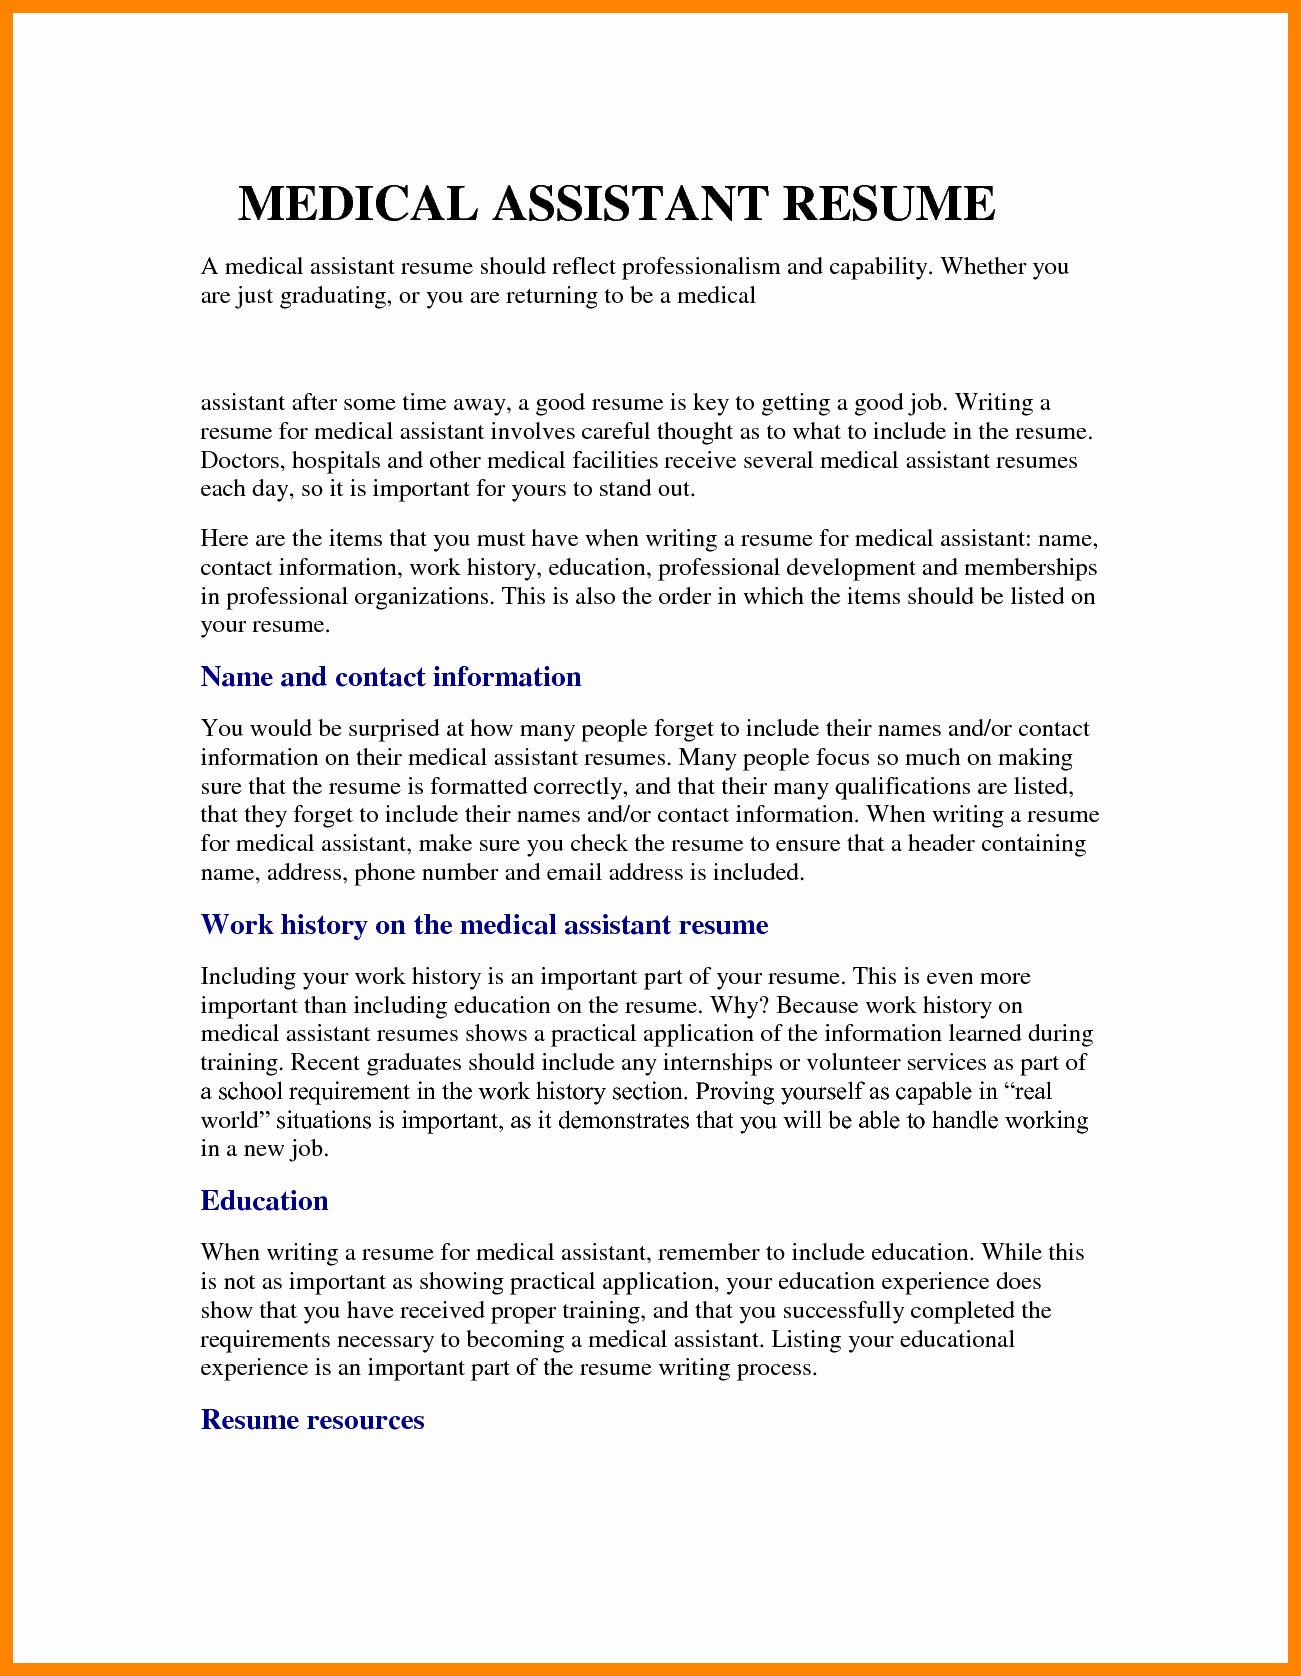 Medical assistant Resume Mission Statement